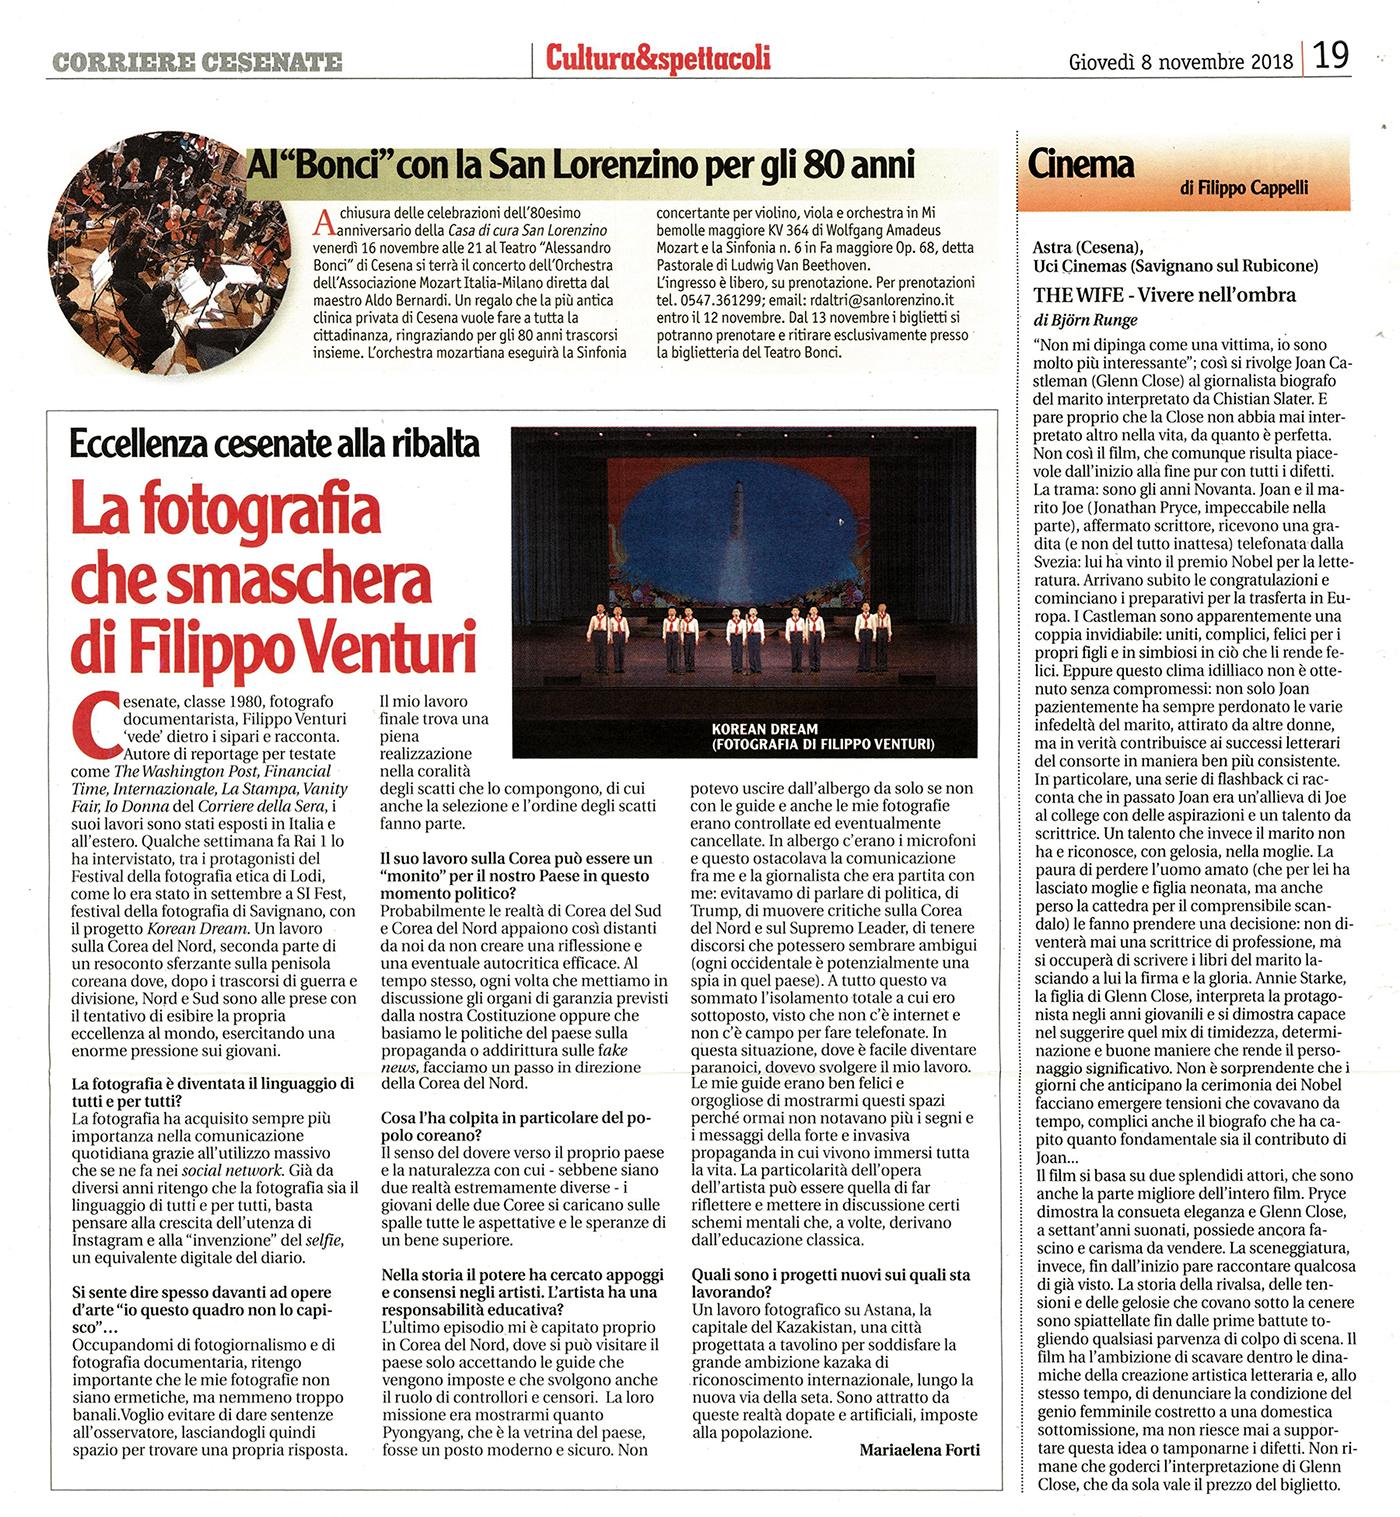 corriere_cesenate_venturi.jpg